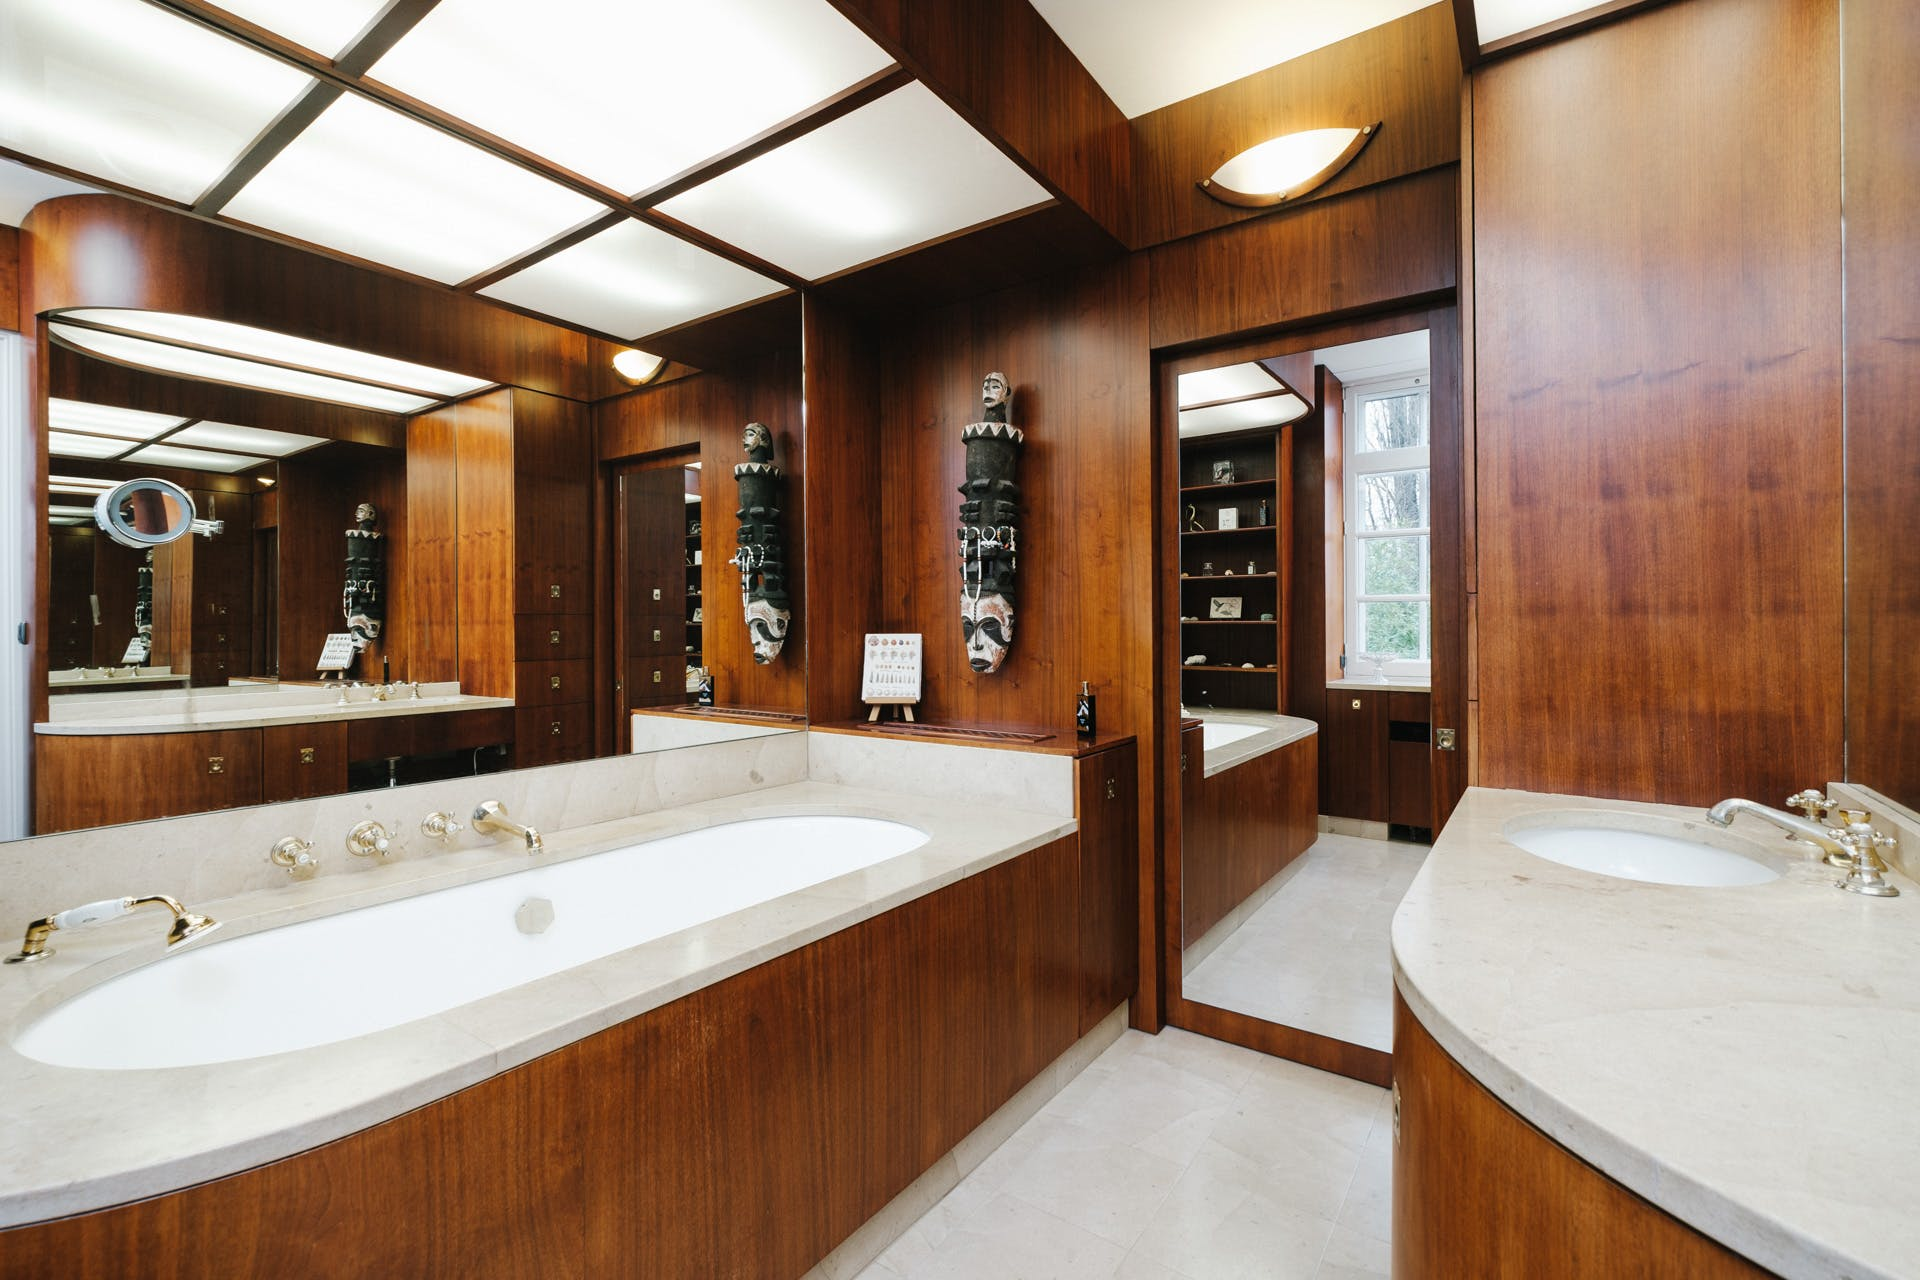 vastgoedfotografie, badkamer, vastgoedfoto's